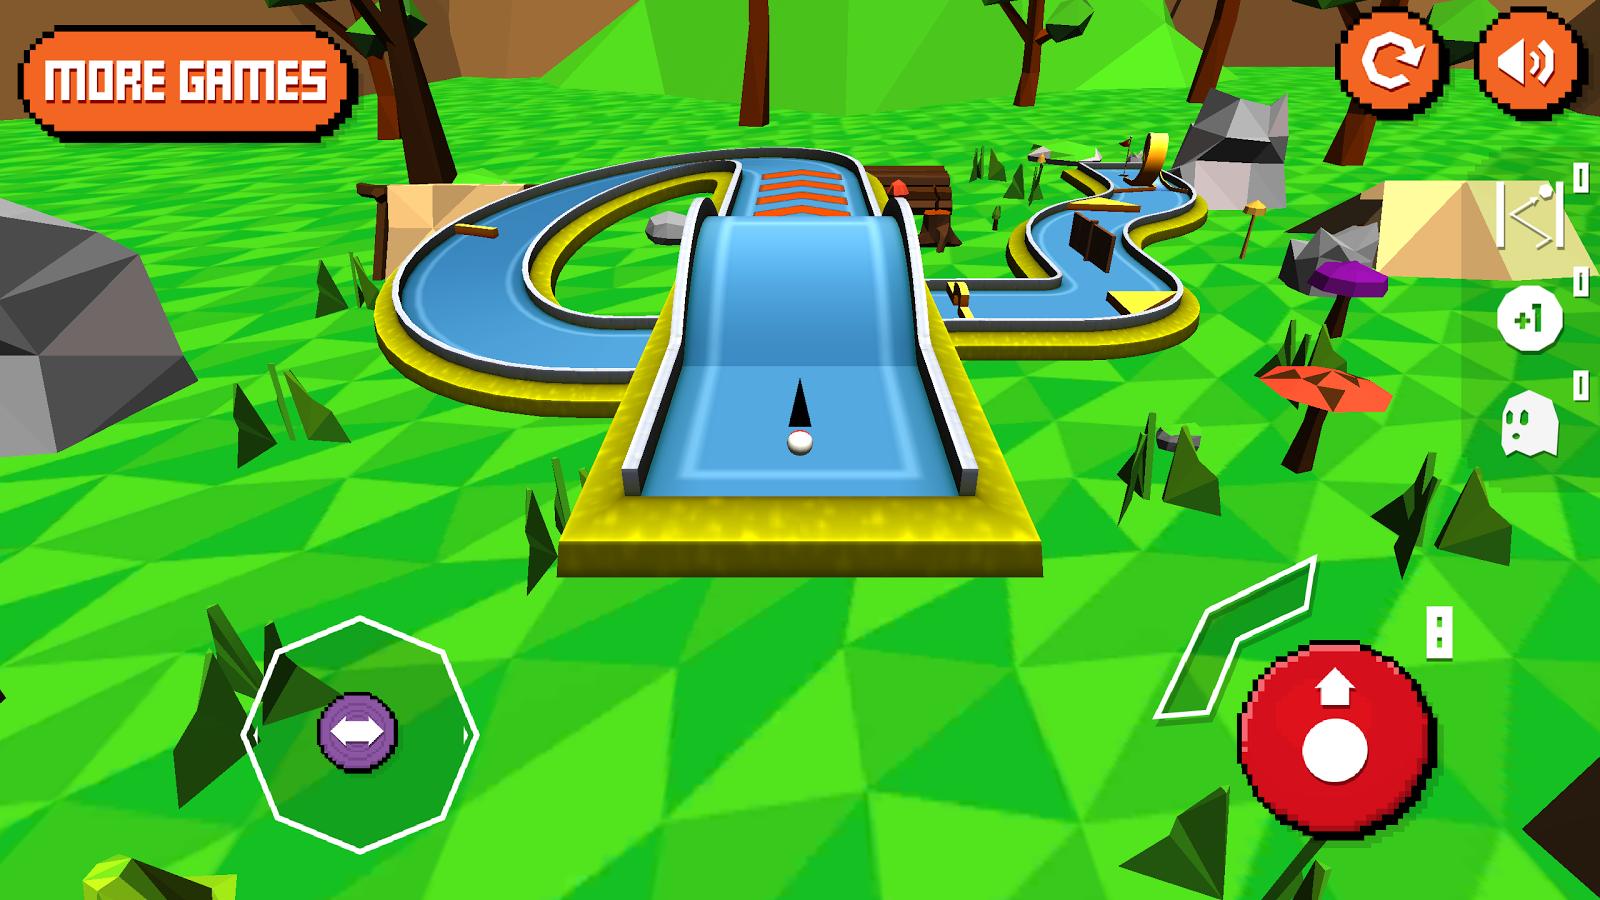 Mini Golf: Retro- screenshot - Mini Golf PNG HD